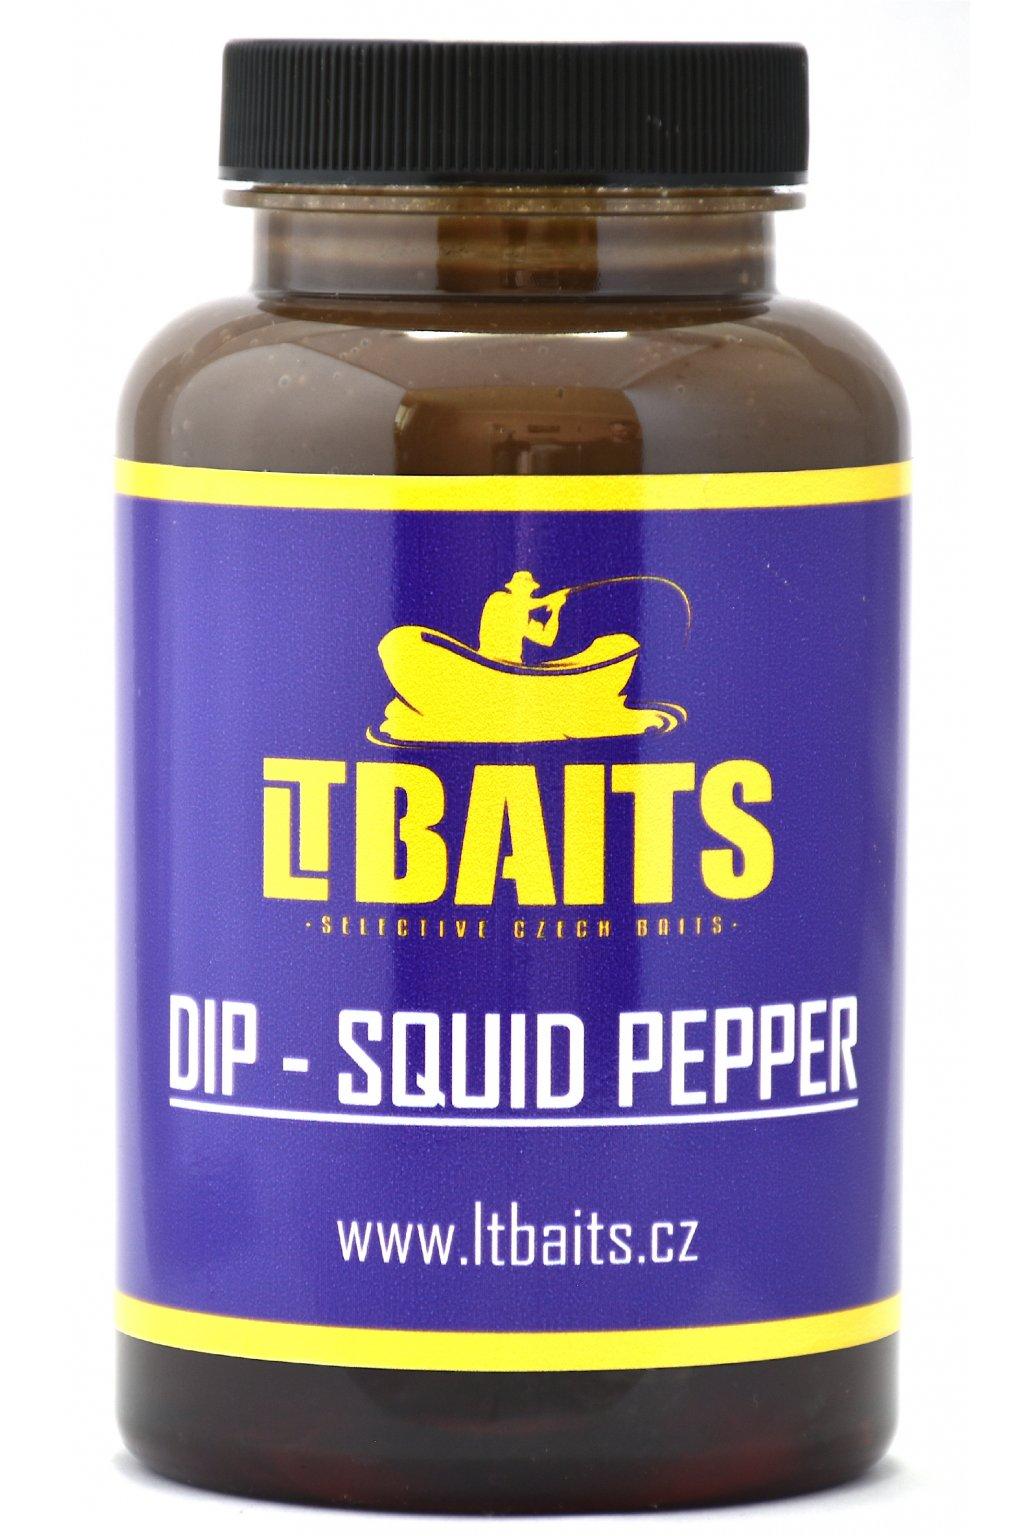 LT Baits DIP Squid Pepper - 300g